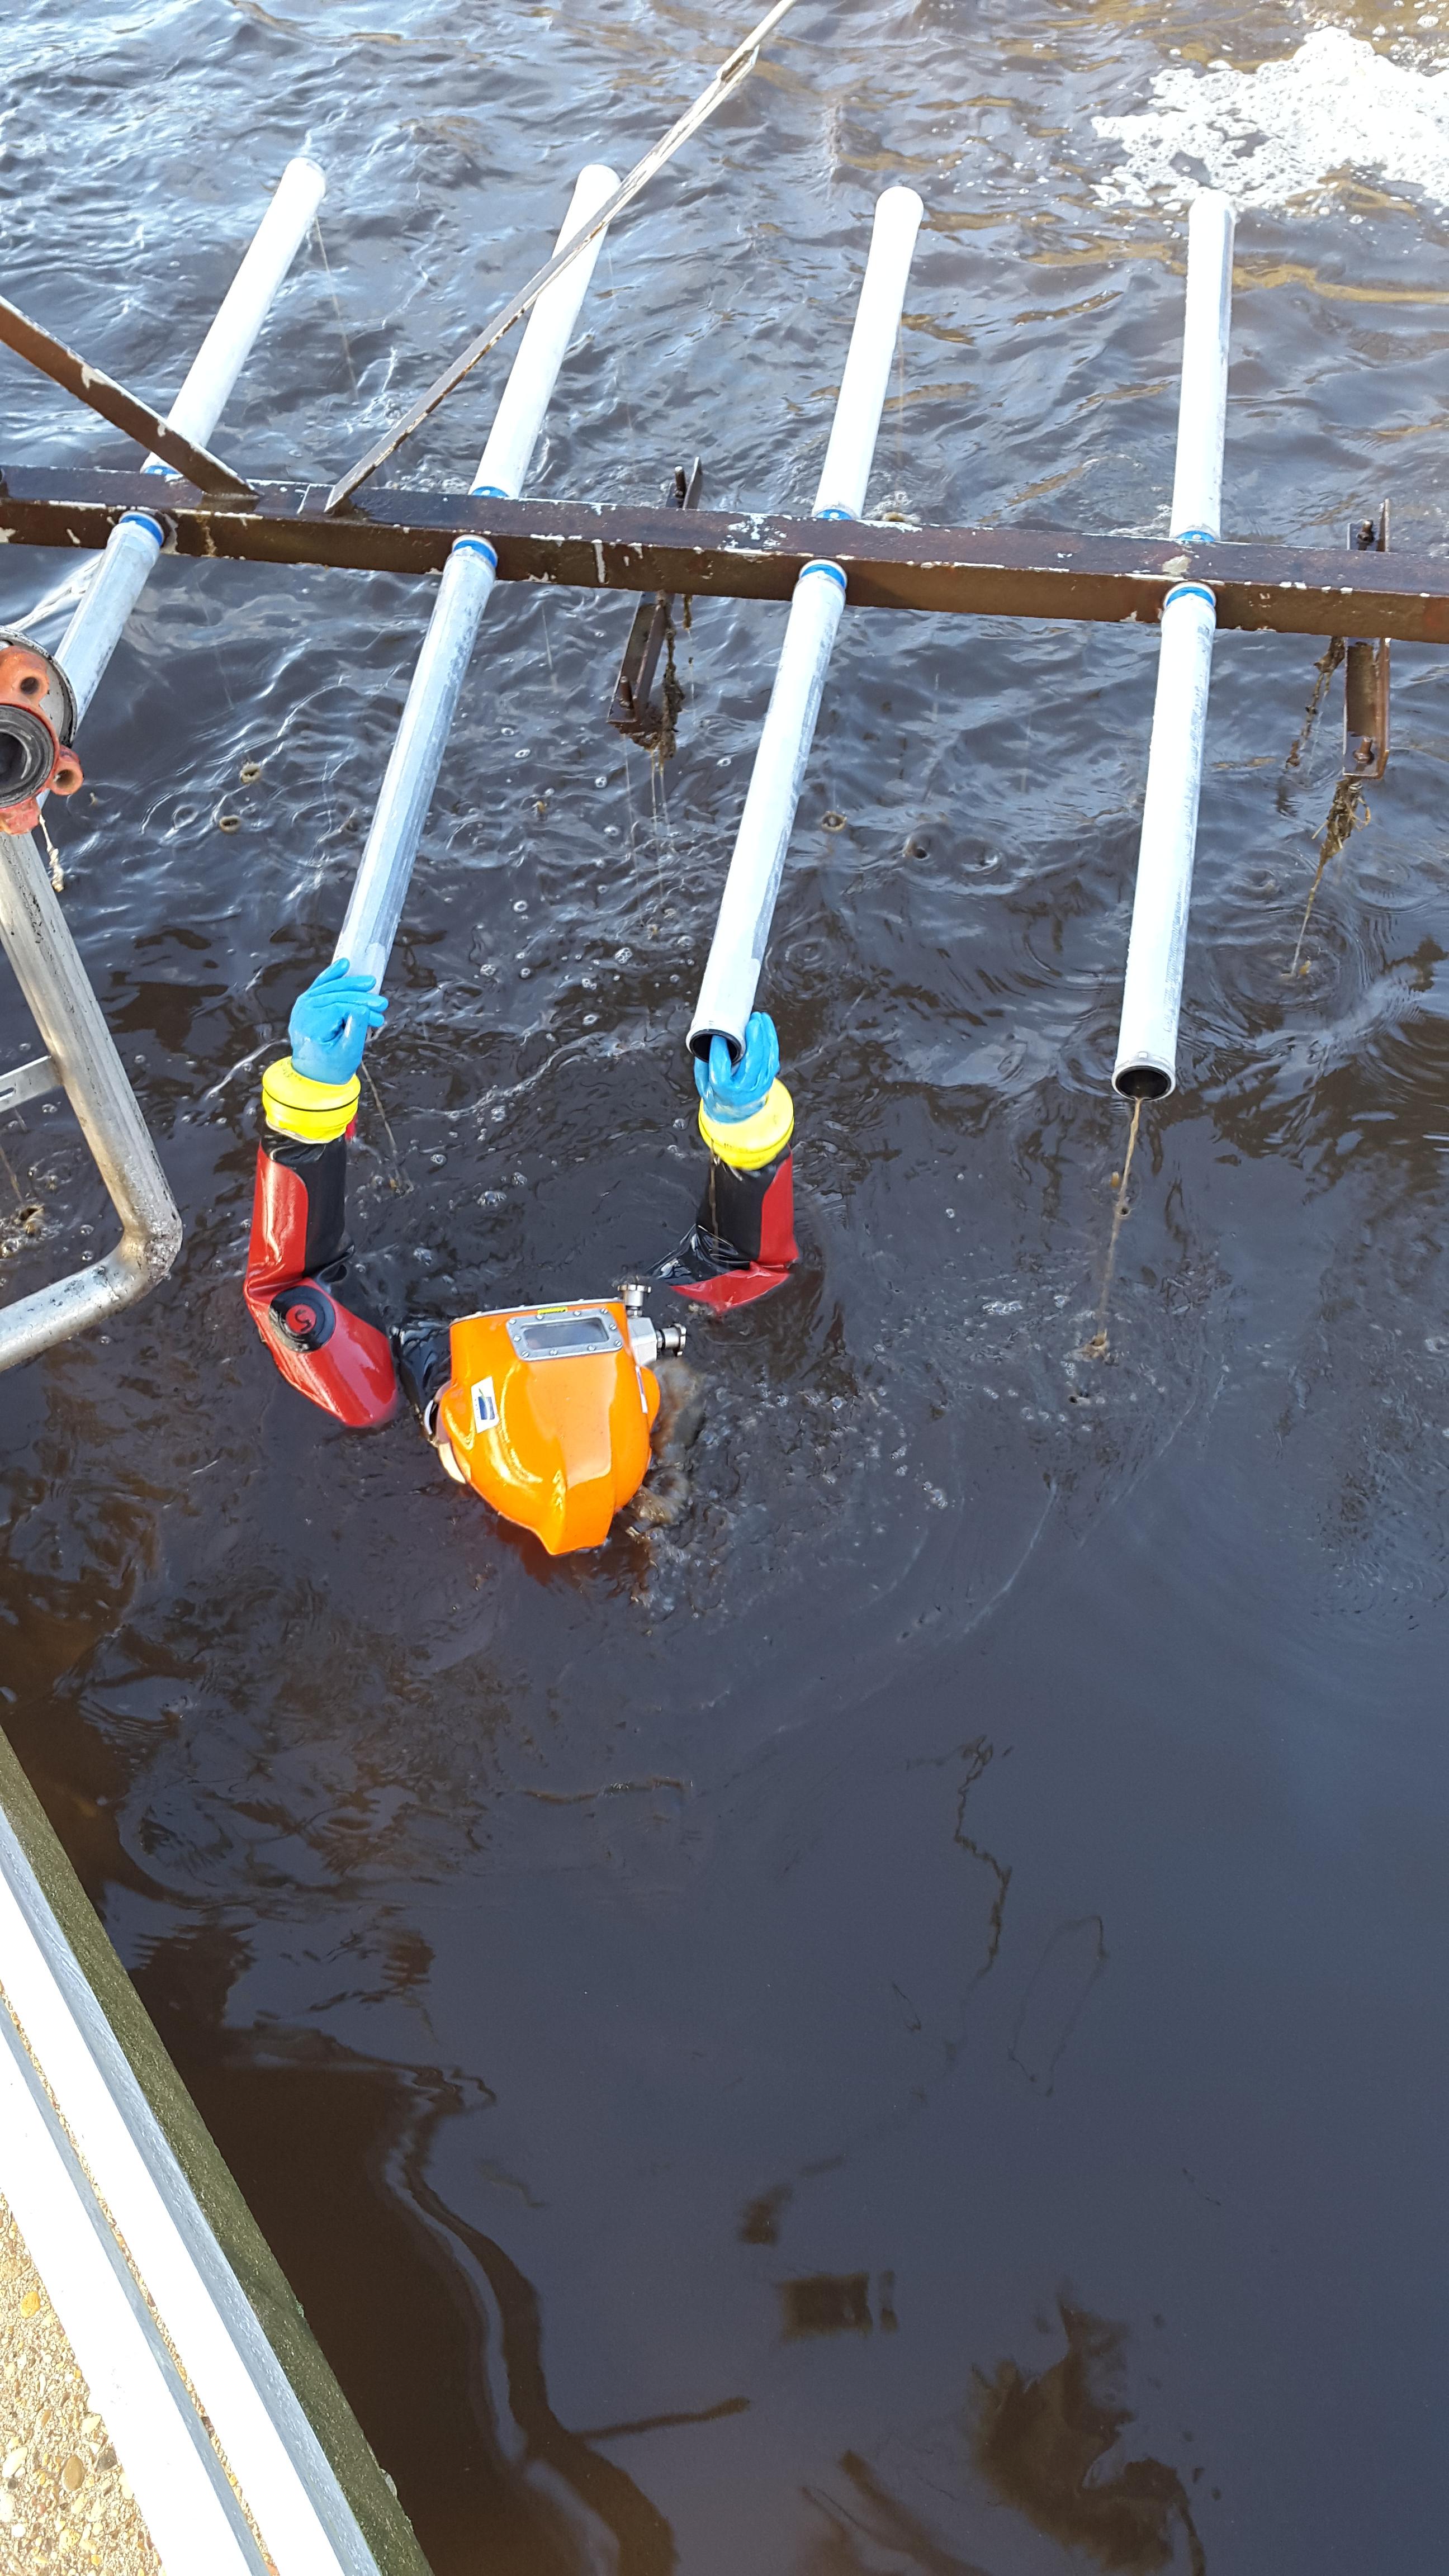 Travaux subaquatiques - Stations d'épuration